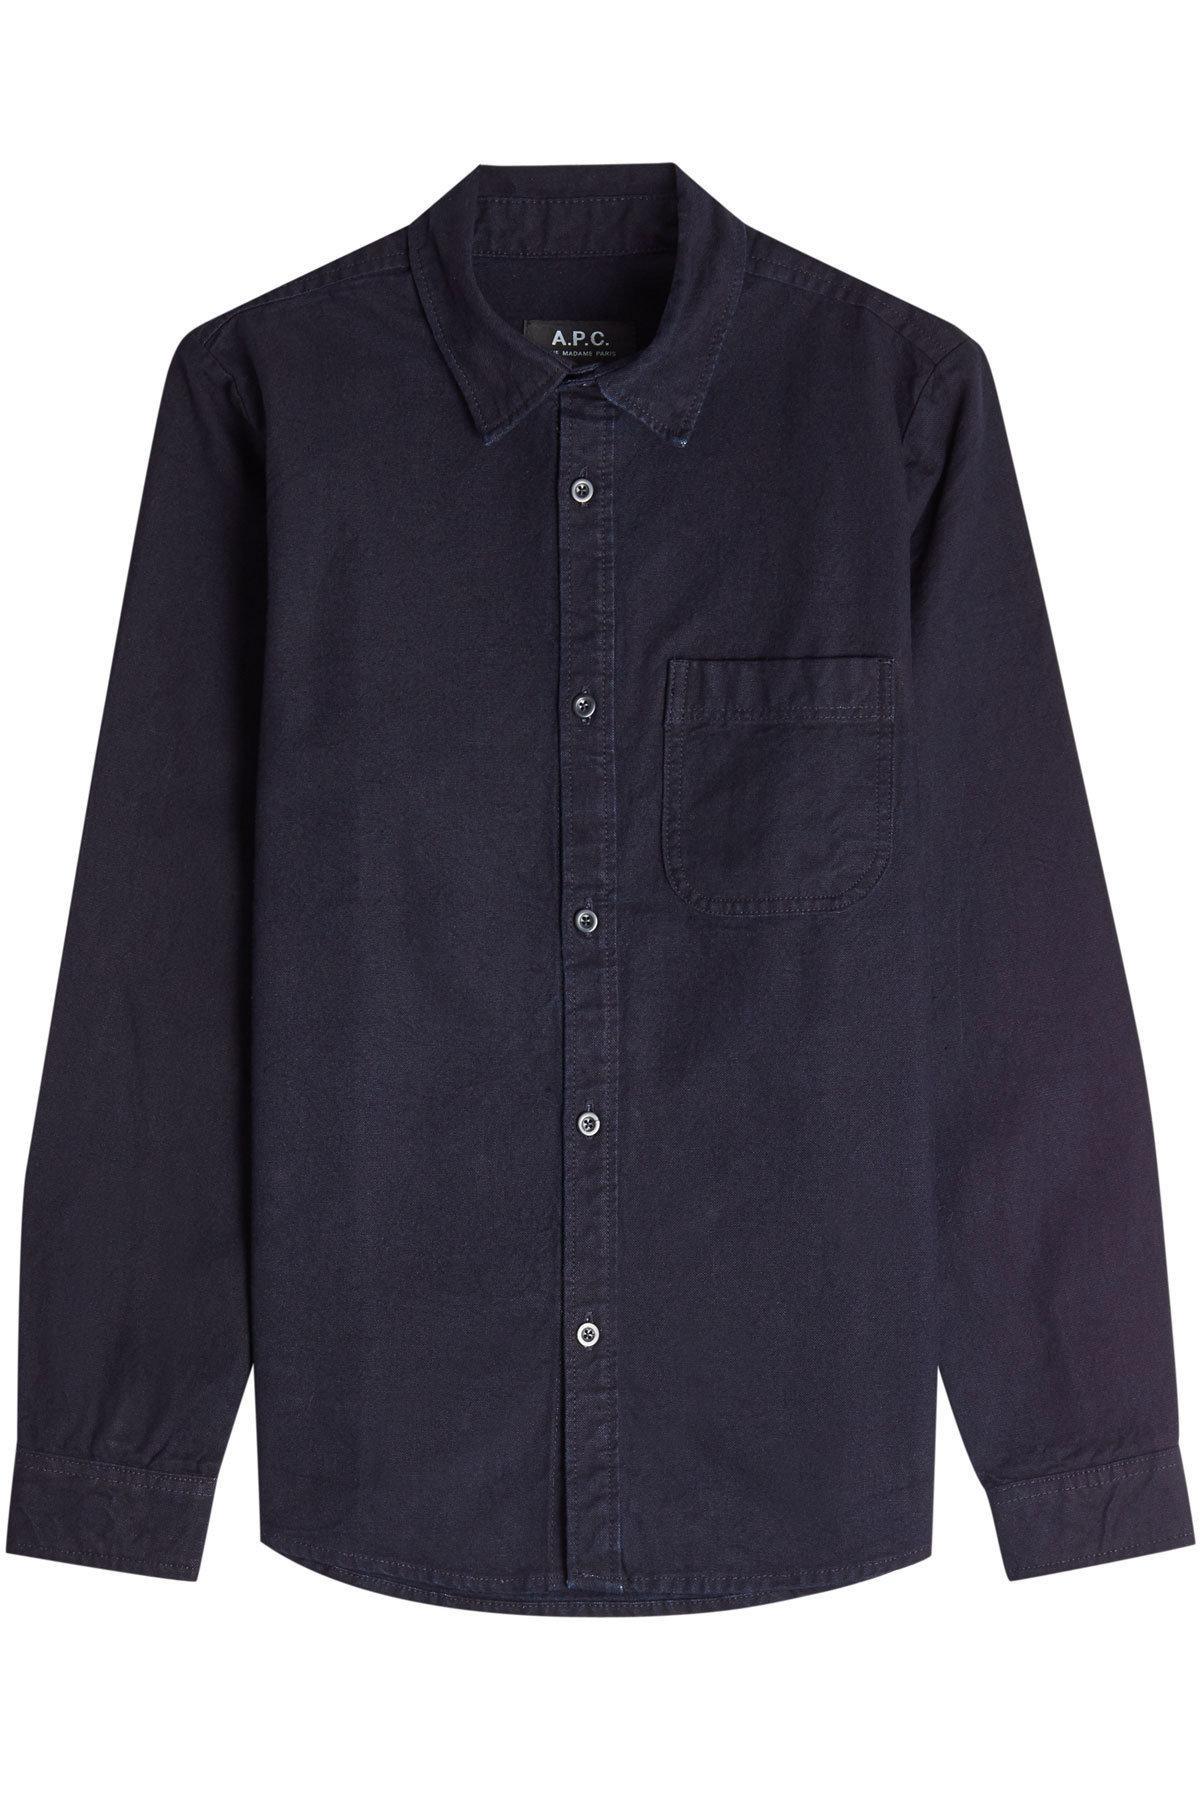 A.P.C. Cotton Shirt In Blue